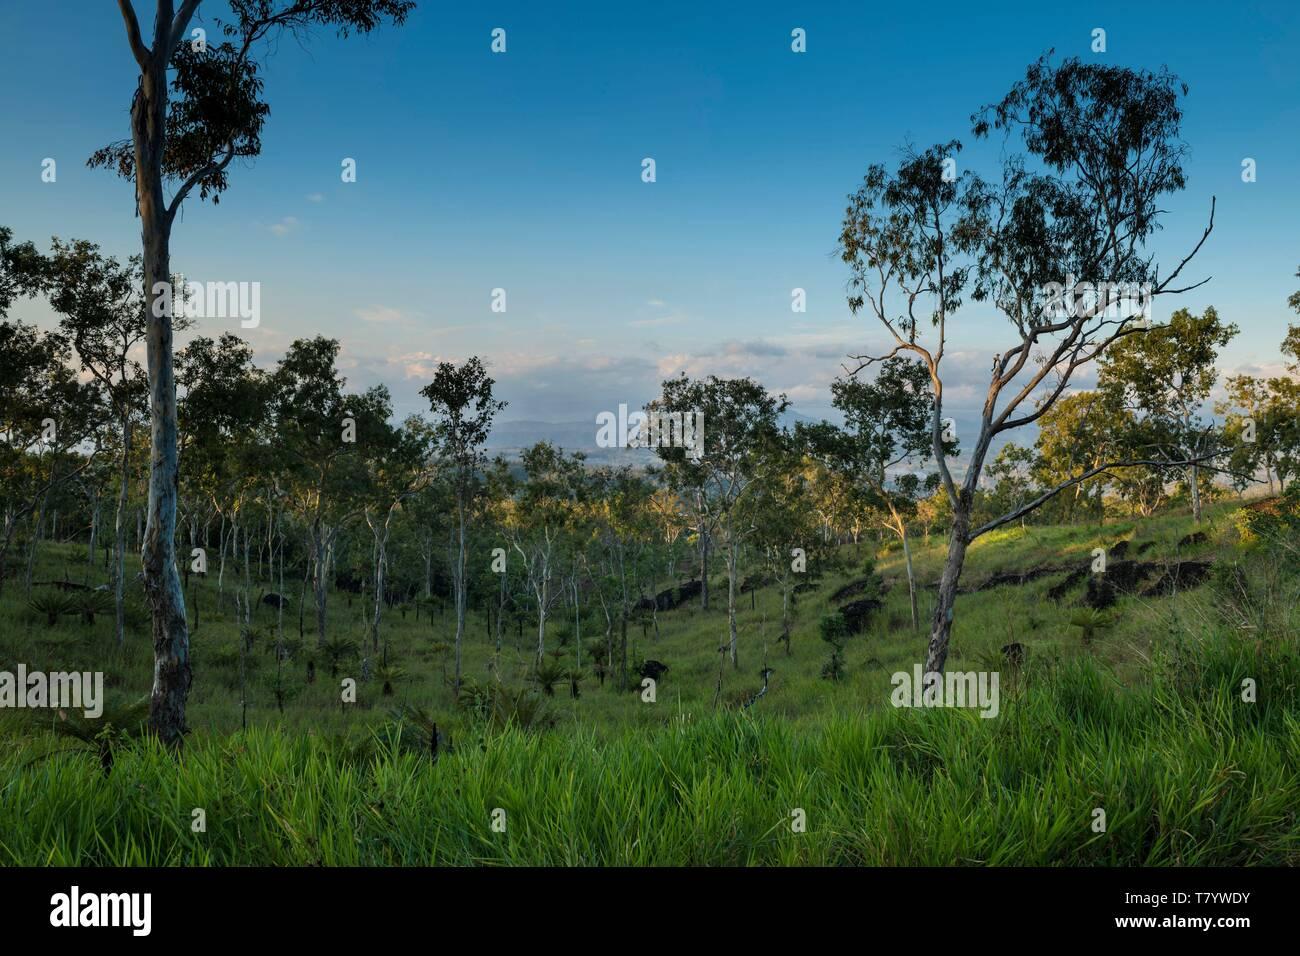 Papua-New-Guinea, Papua bay, National Capital District, Port Moresby town, Varirata National Park Stock Photo